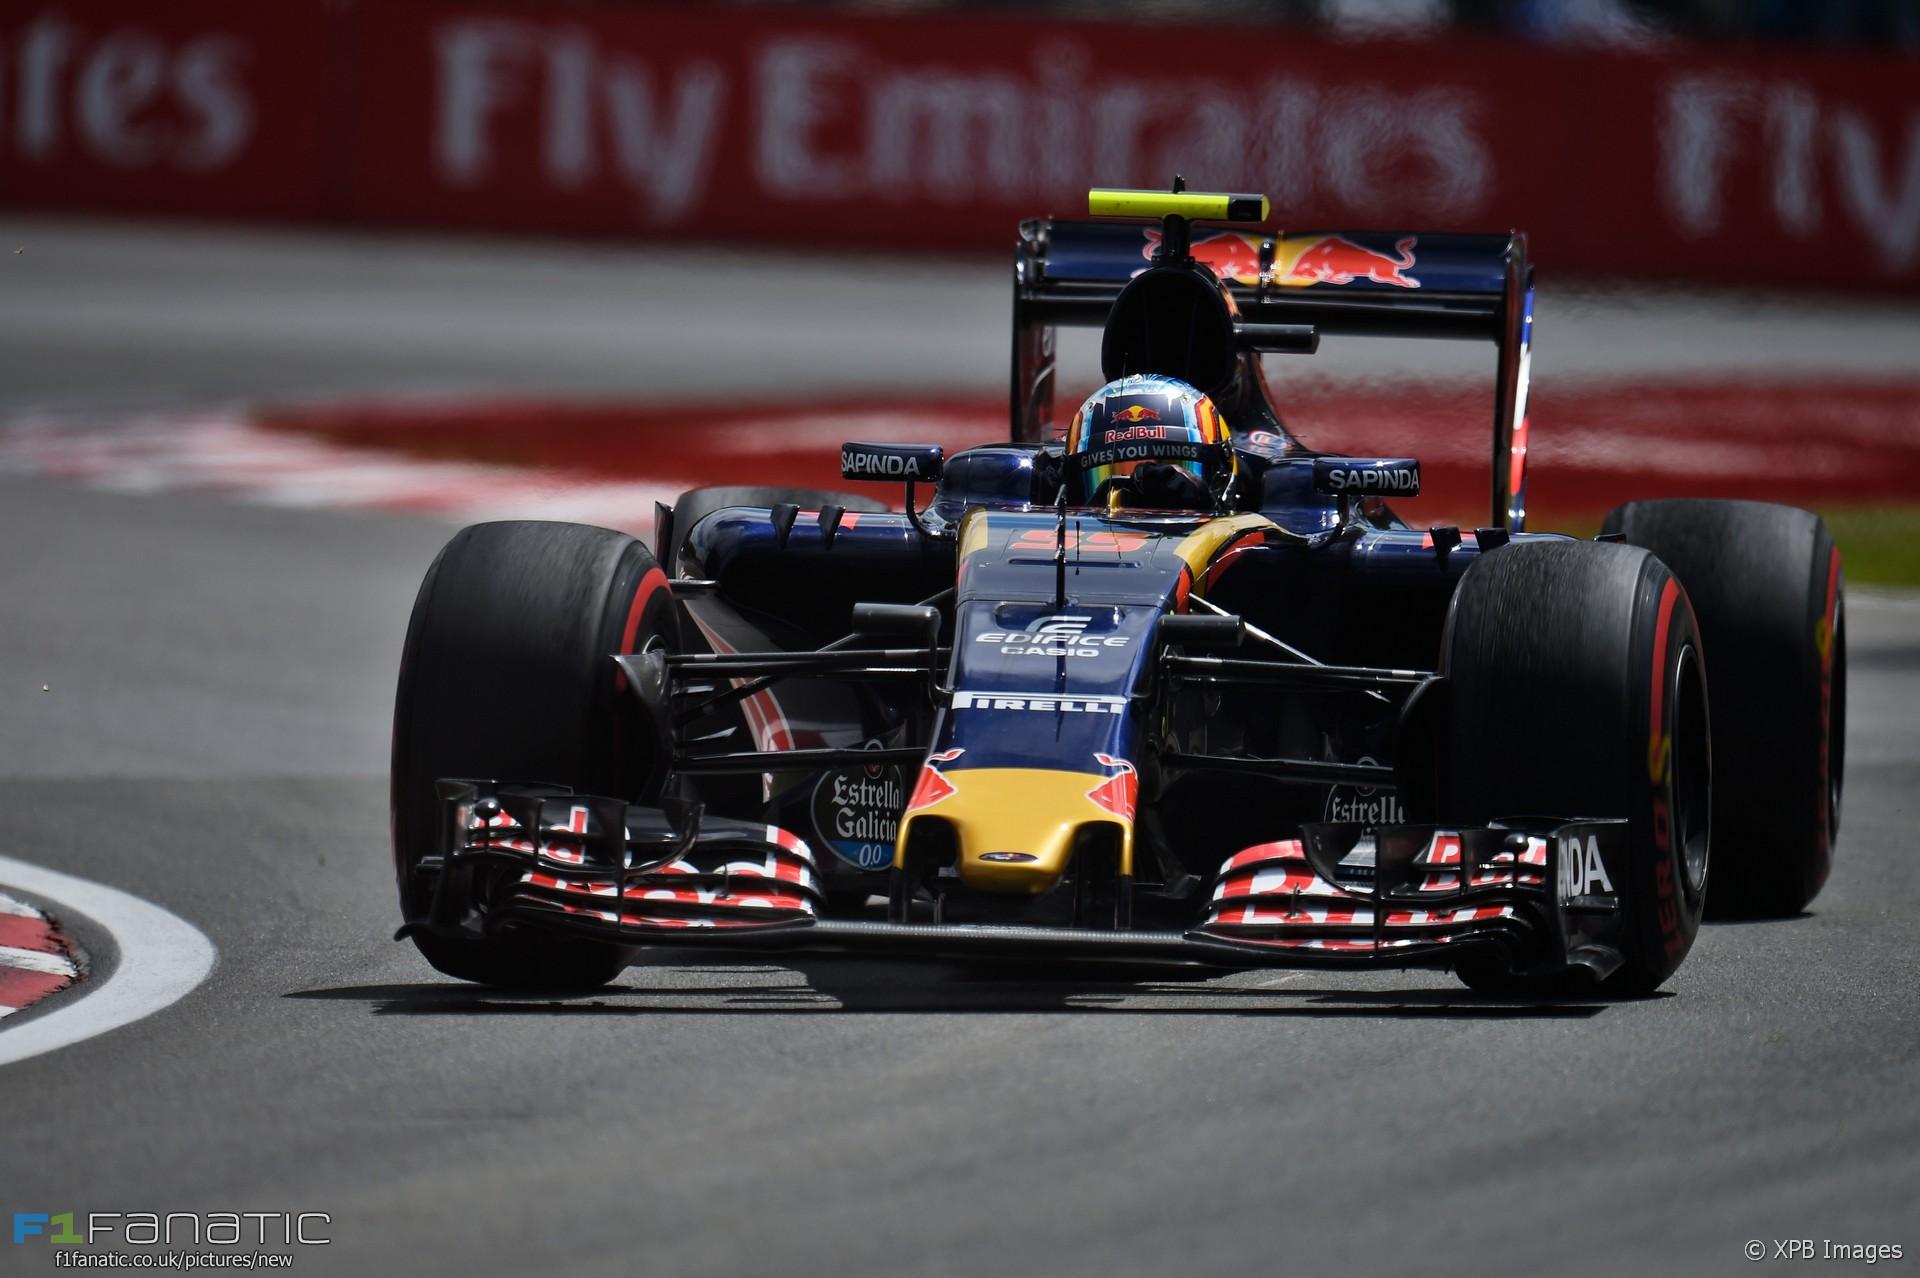 Carlos Sainz Jnr, Toro Rosso, Circuit Gilles Villeneuve, 2016